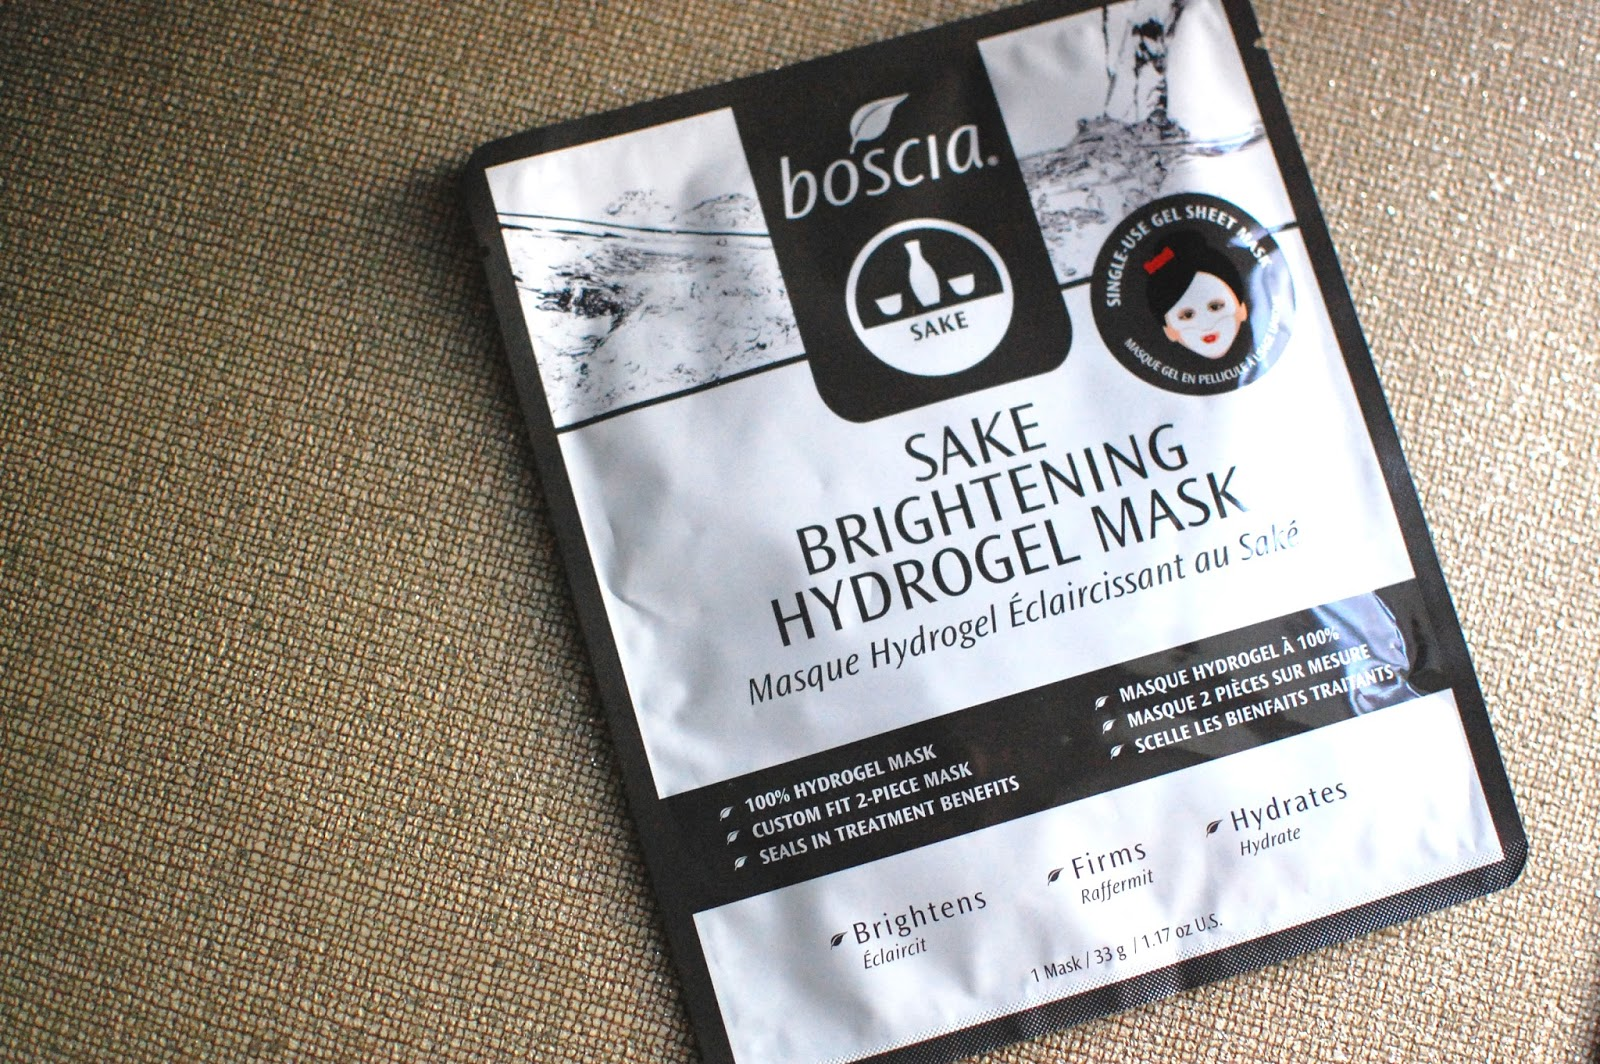 The Redolent Mermaid Skin Care Boscia Sake Brightening Hydrogel Mask